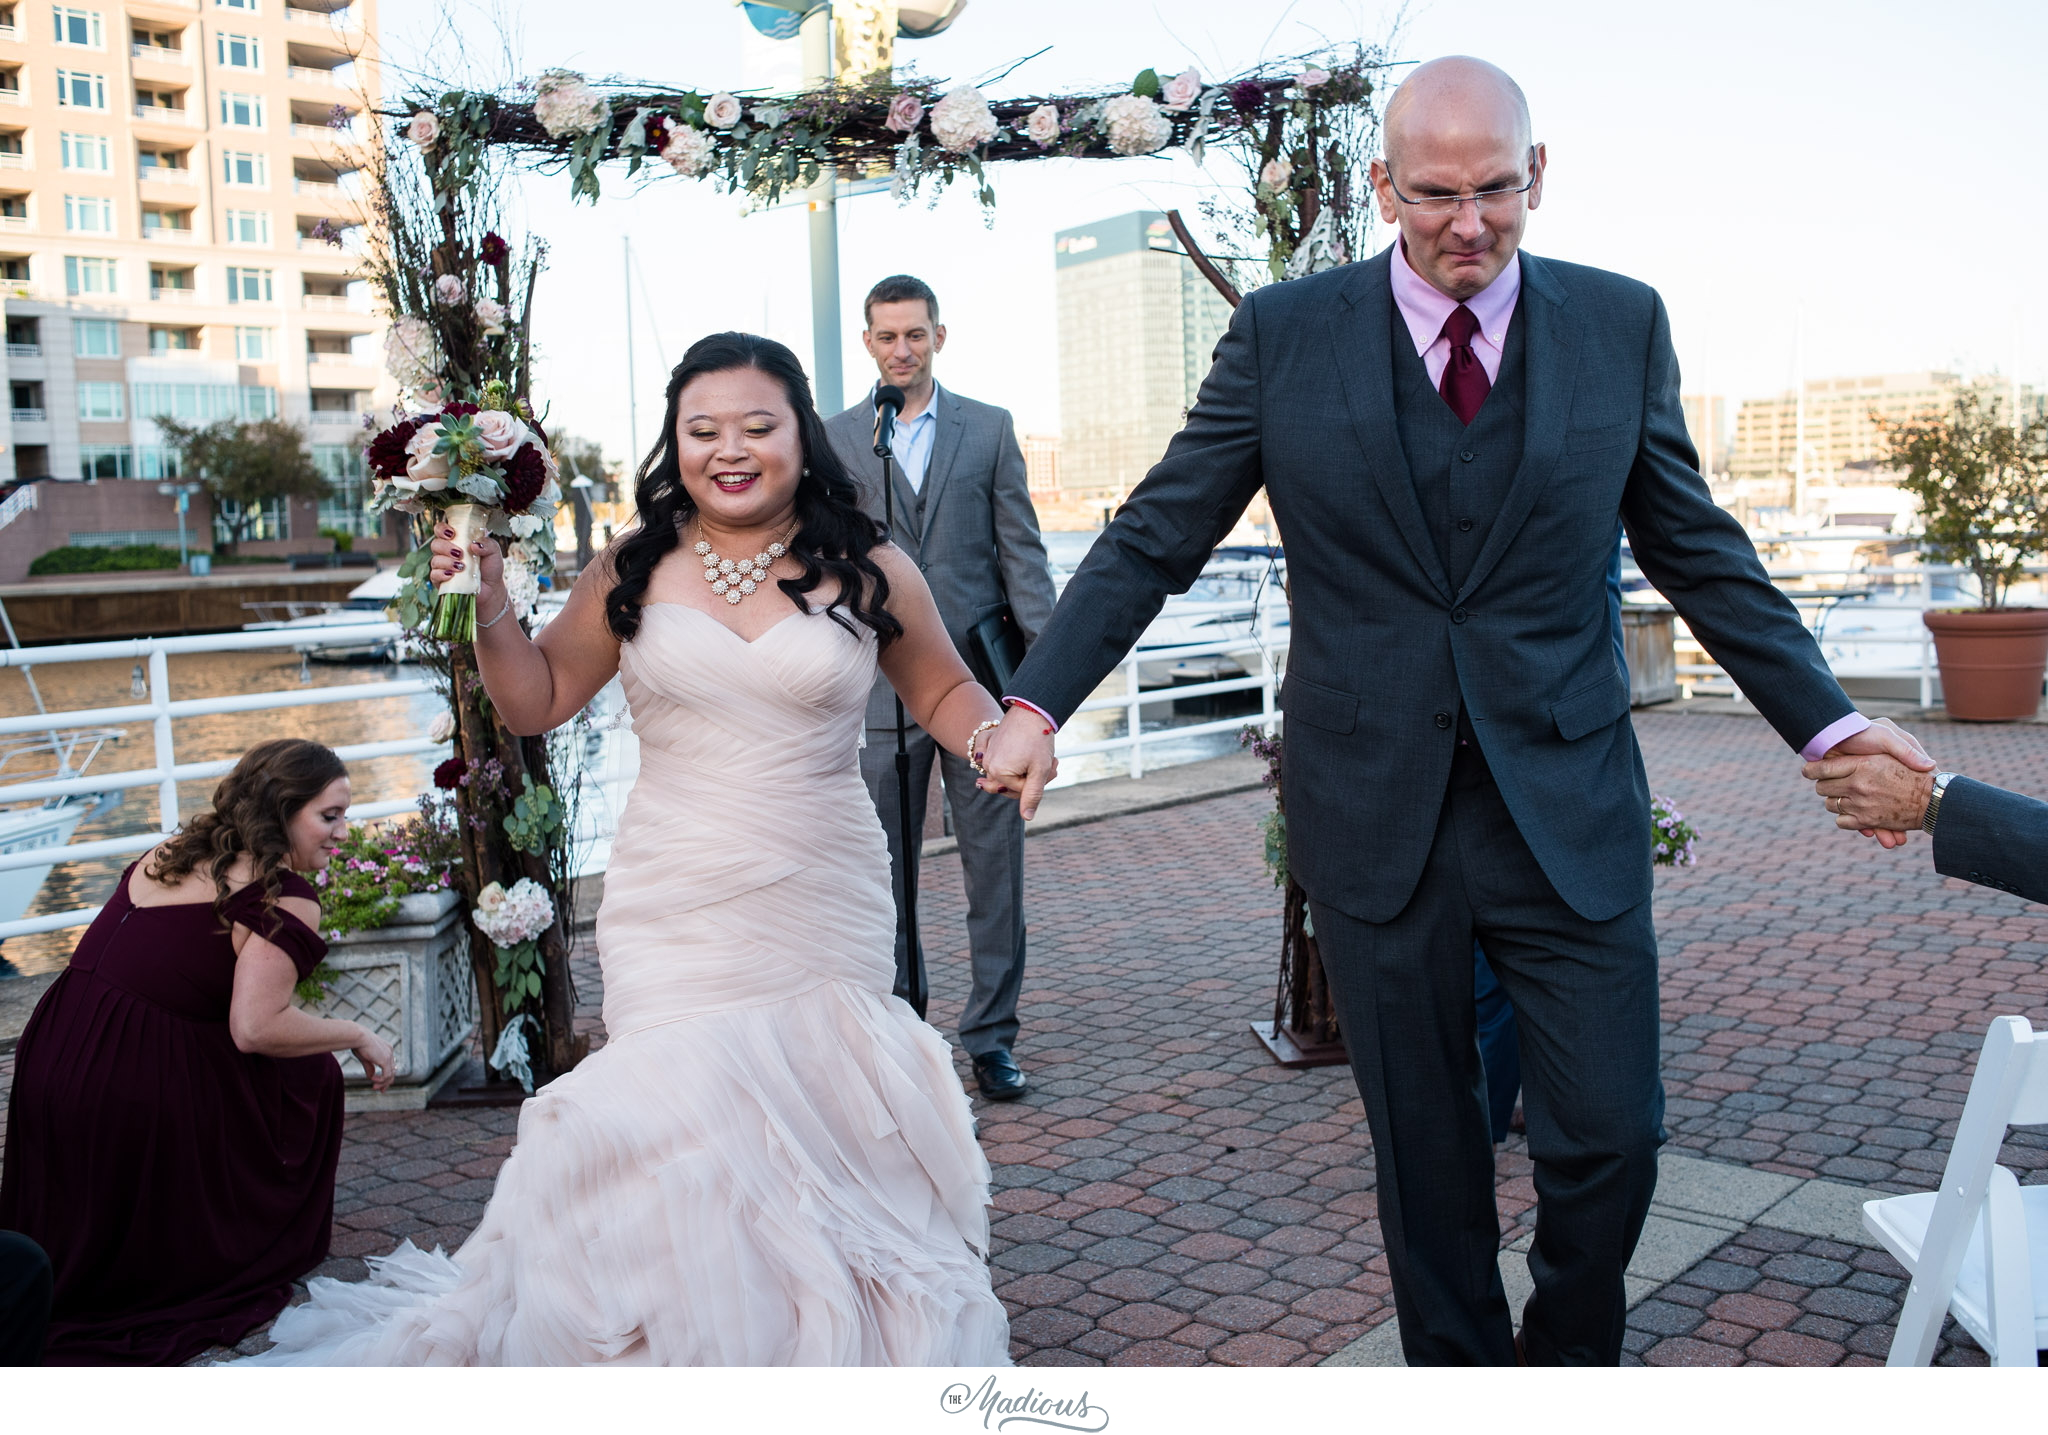 Tabrizis Wedding Baltimore_0026.jpg